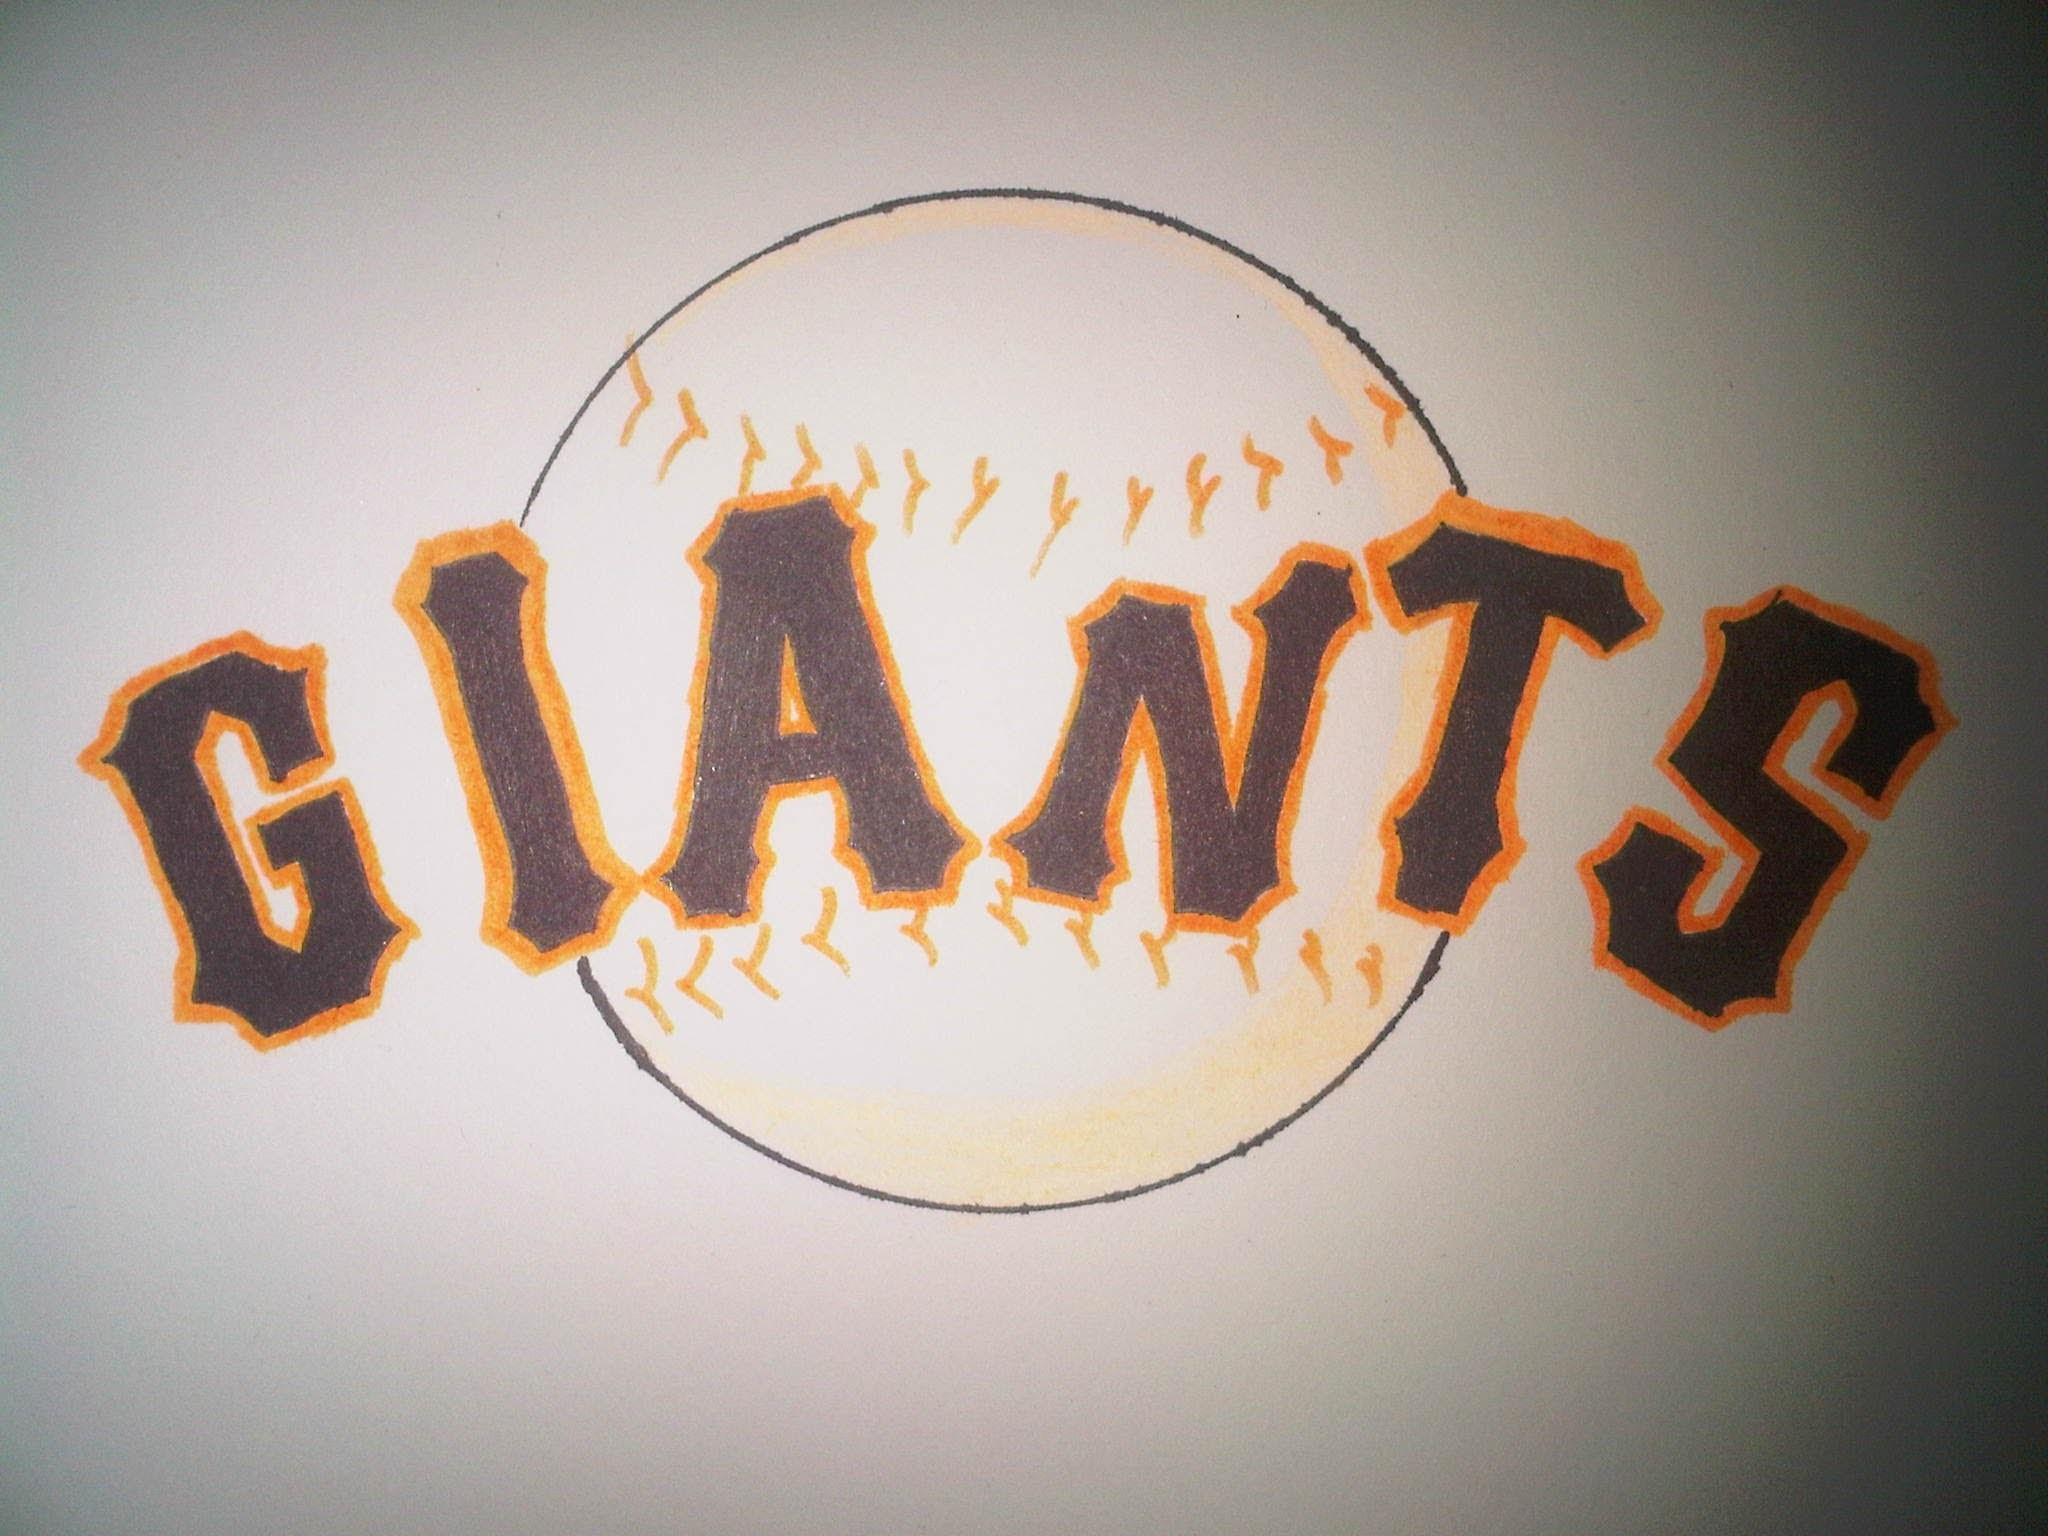 Brewers Wallpaper Iphone San Francisco Giants Logo Wallpapers 183 ① Wallpapertag